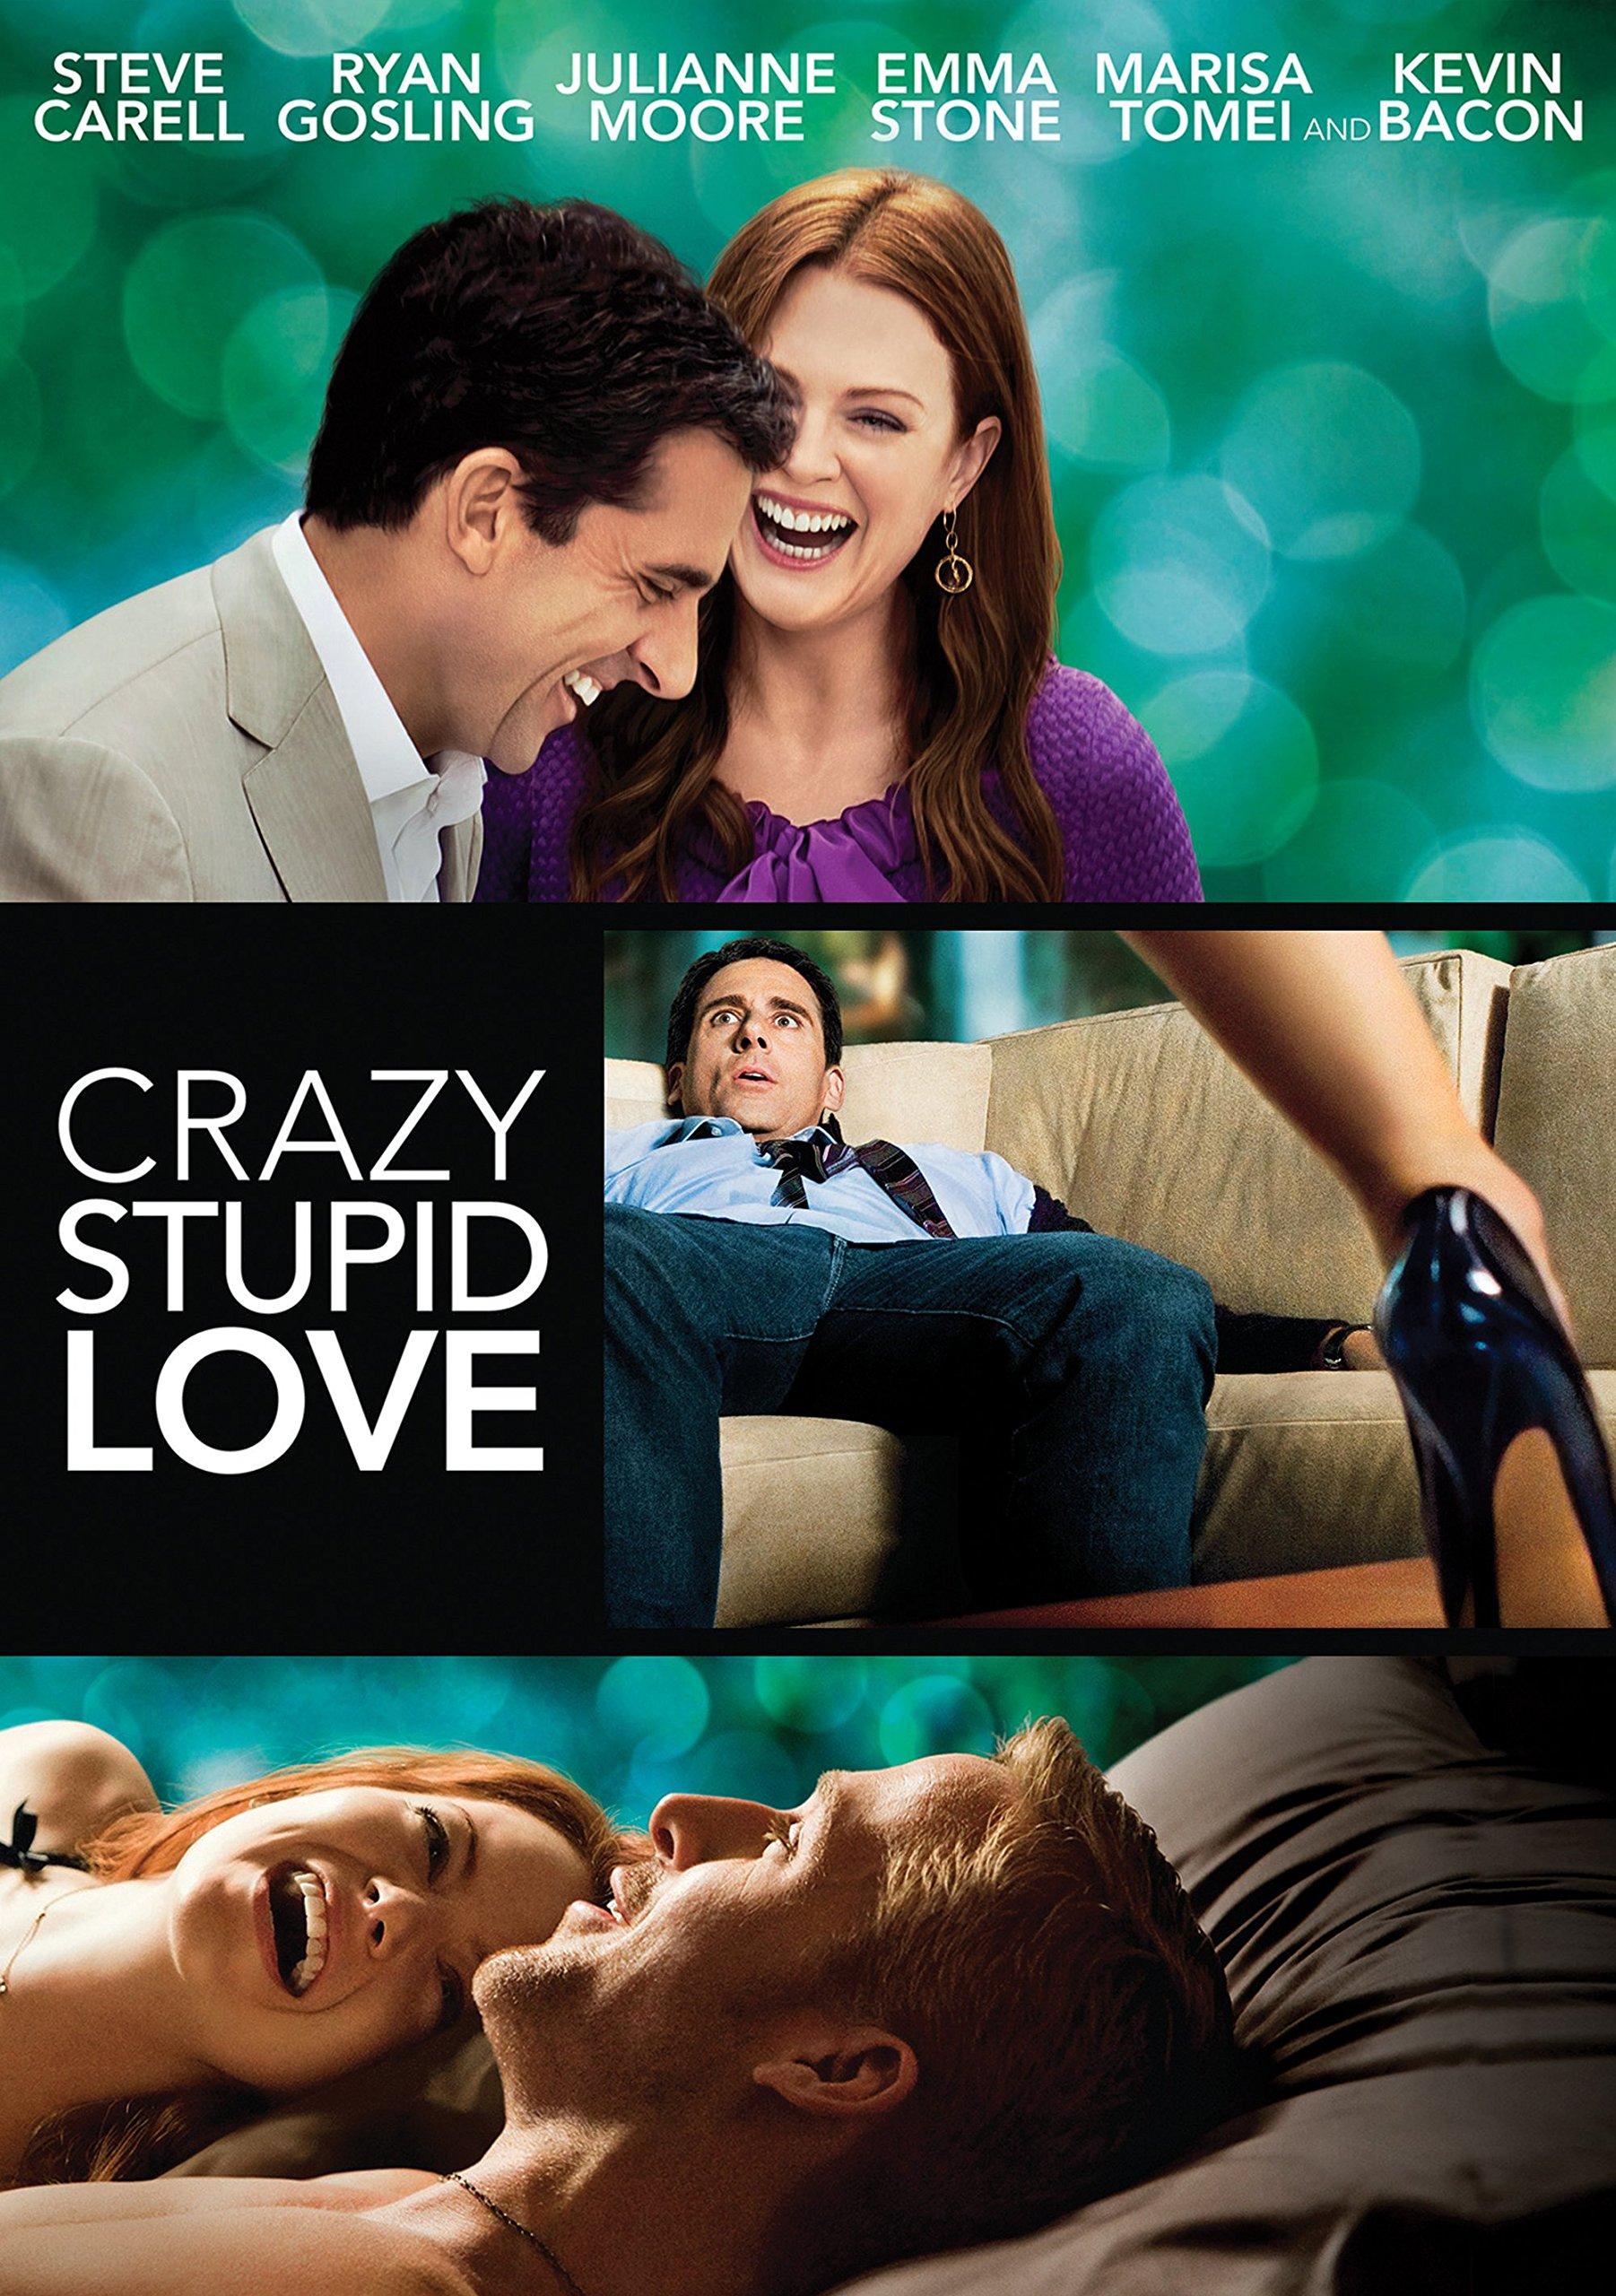 Amazoncom Crazy Stupid Love Steve Carell Ryan Gosling